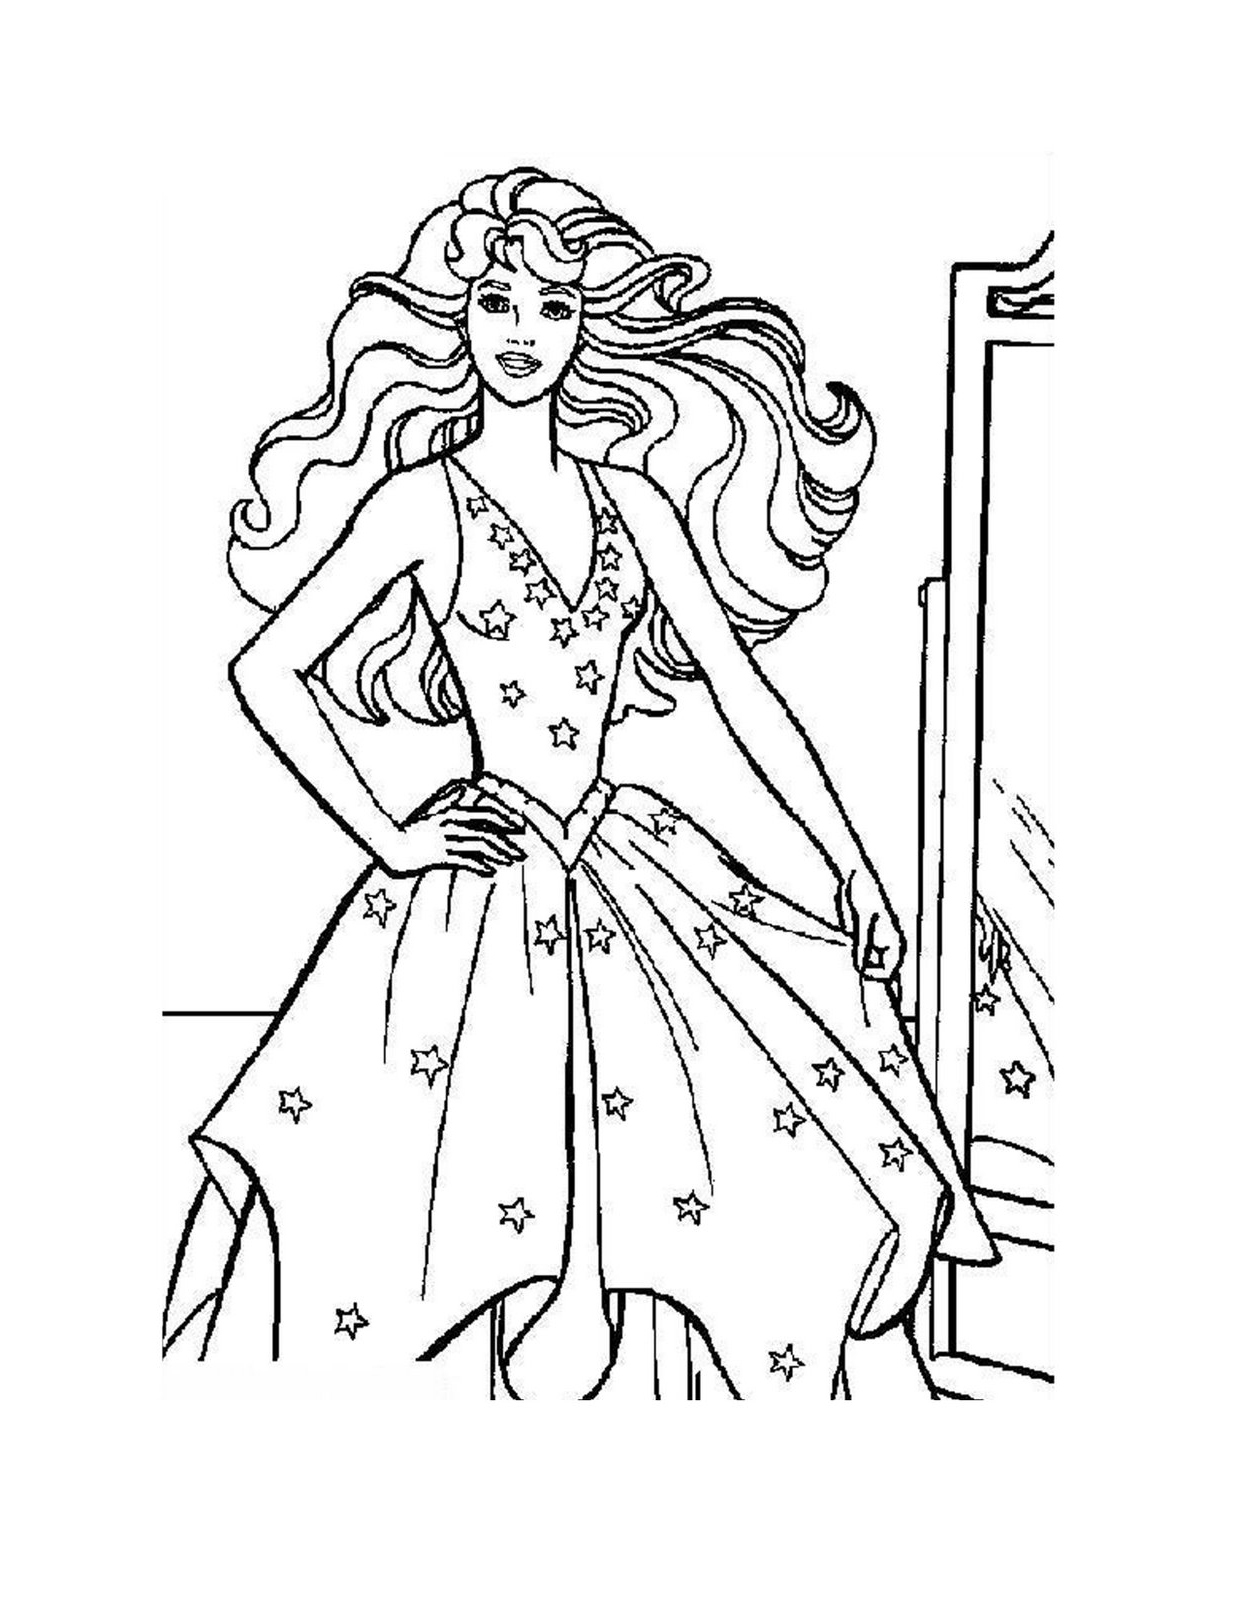 Drawn palace barbie Disney Princess Pages Coloring Disney